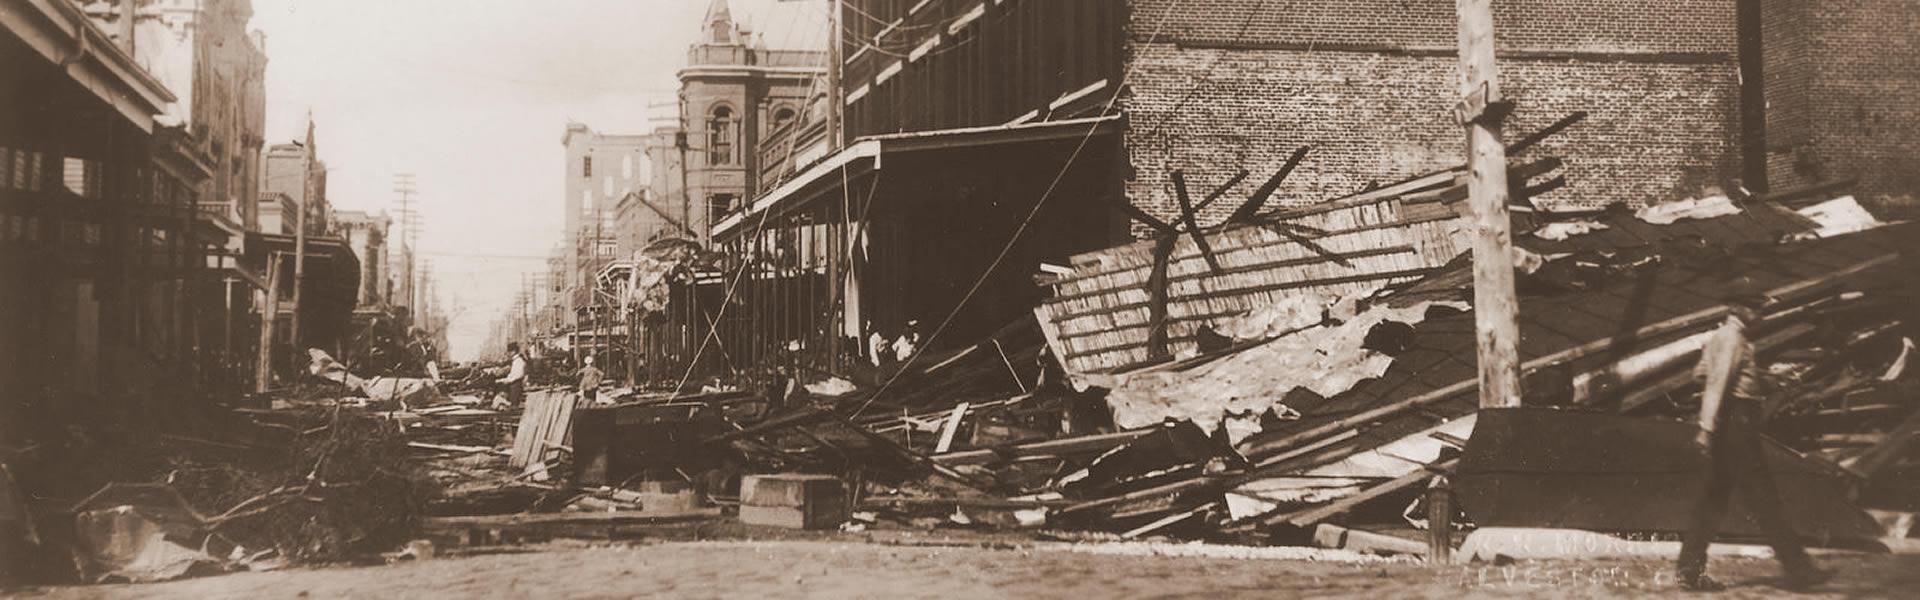 1900 Storm on Strand Damage